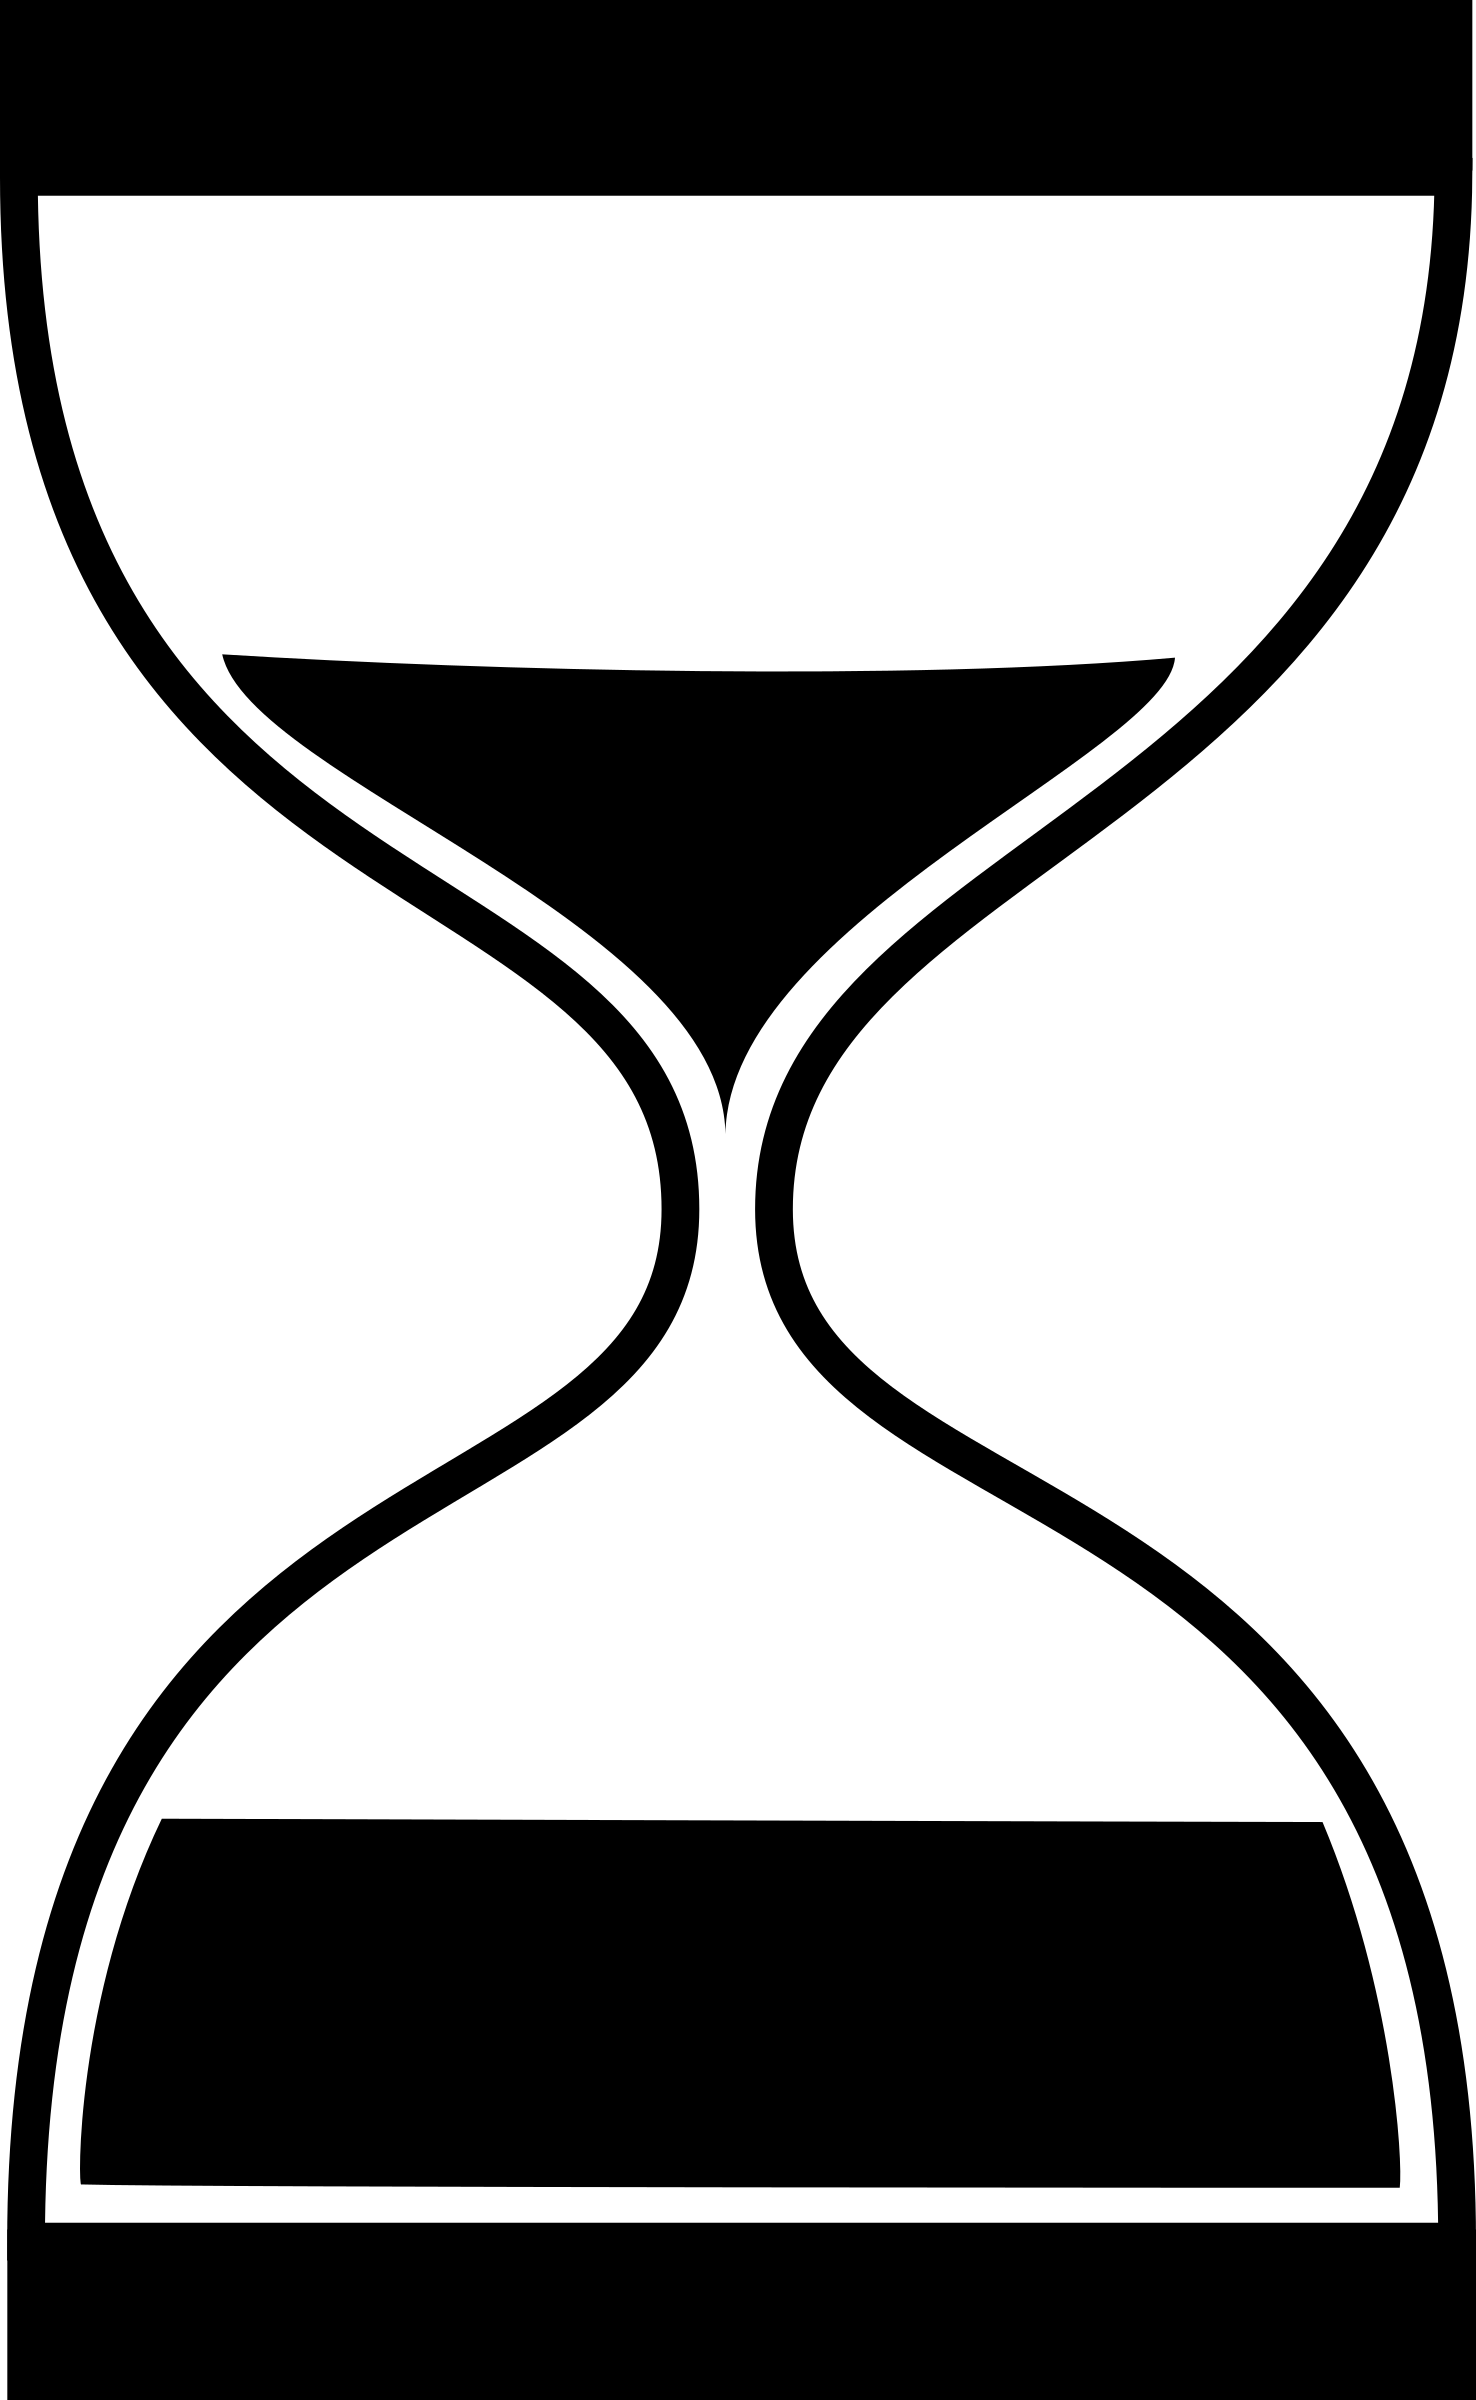 Hourglass clipart earth Hourglass babaimage clipart ClipartBarn hourglass